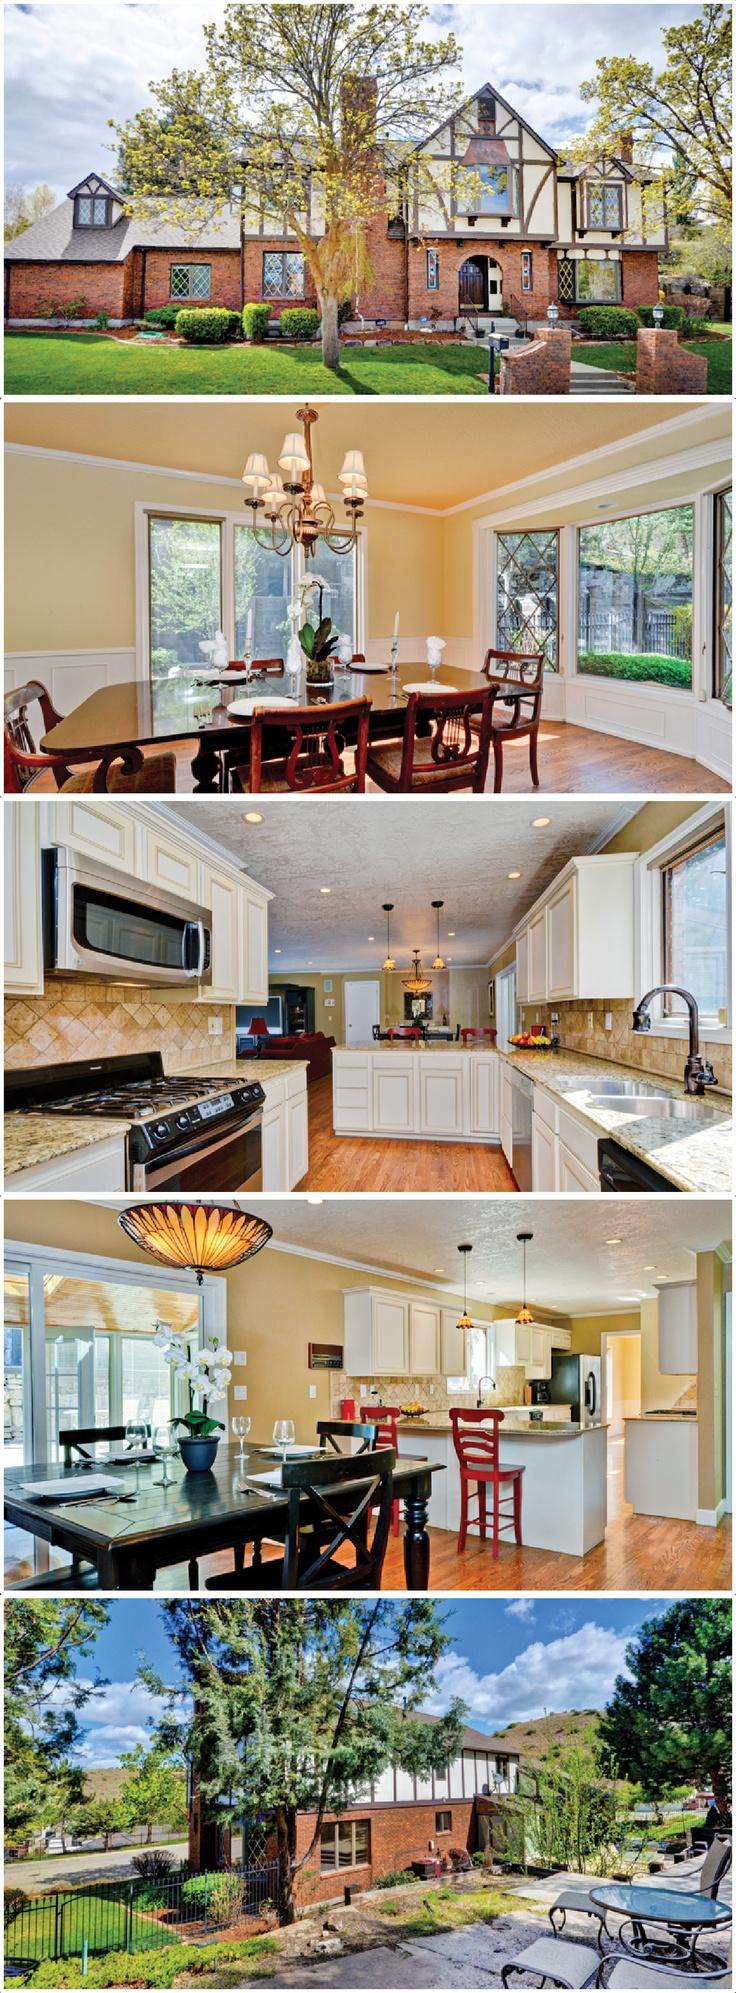 Classic Tudor Style In Coveted Neighborhood :: N Boise   Highlands ::  $599,900